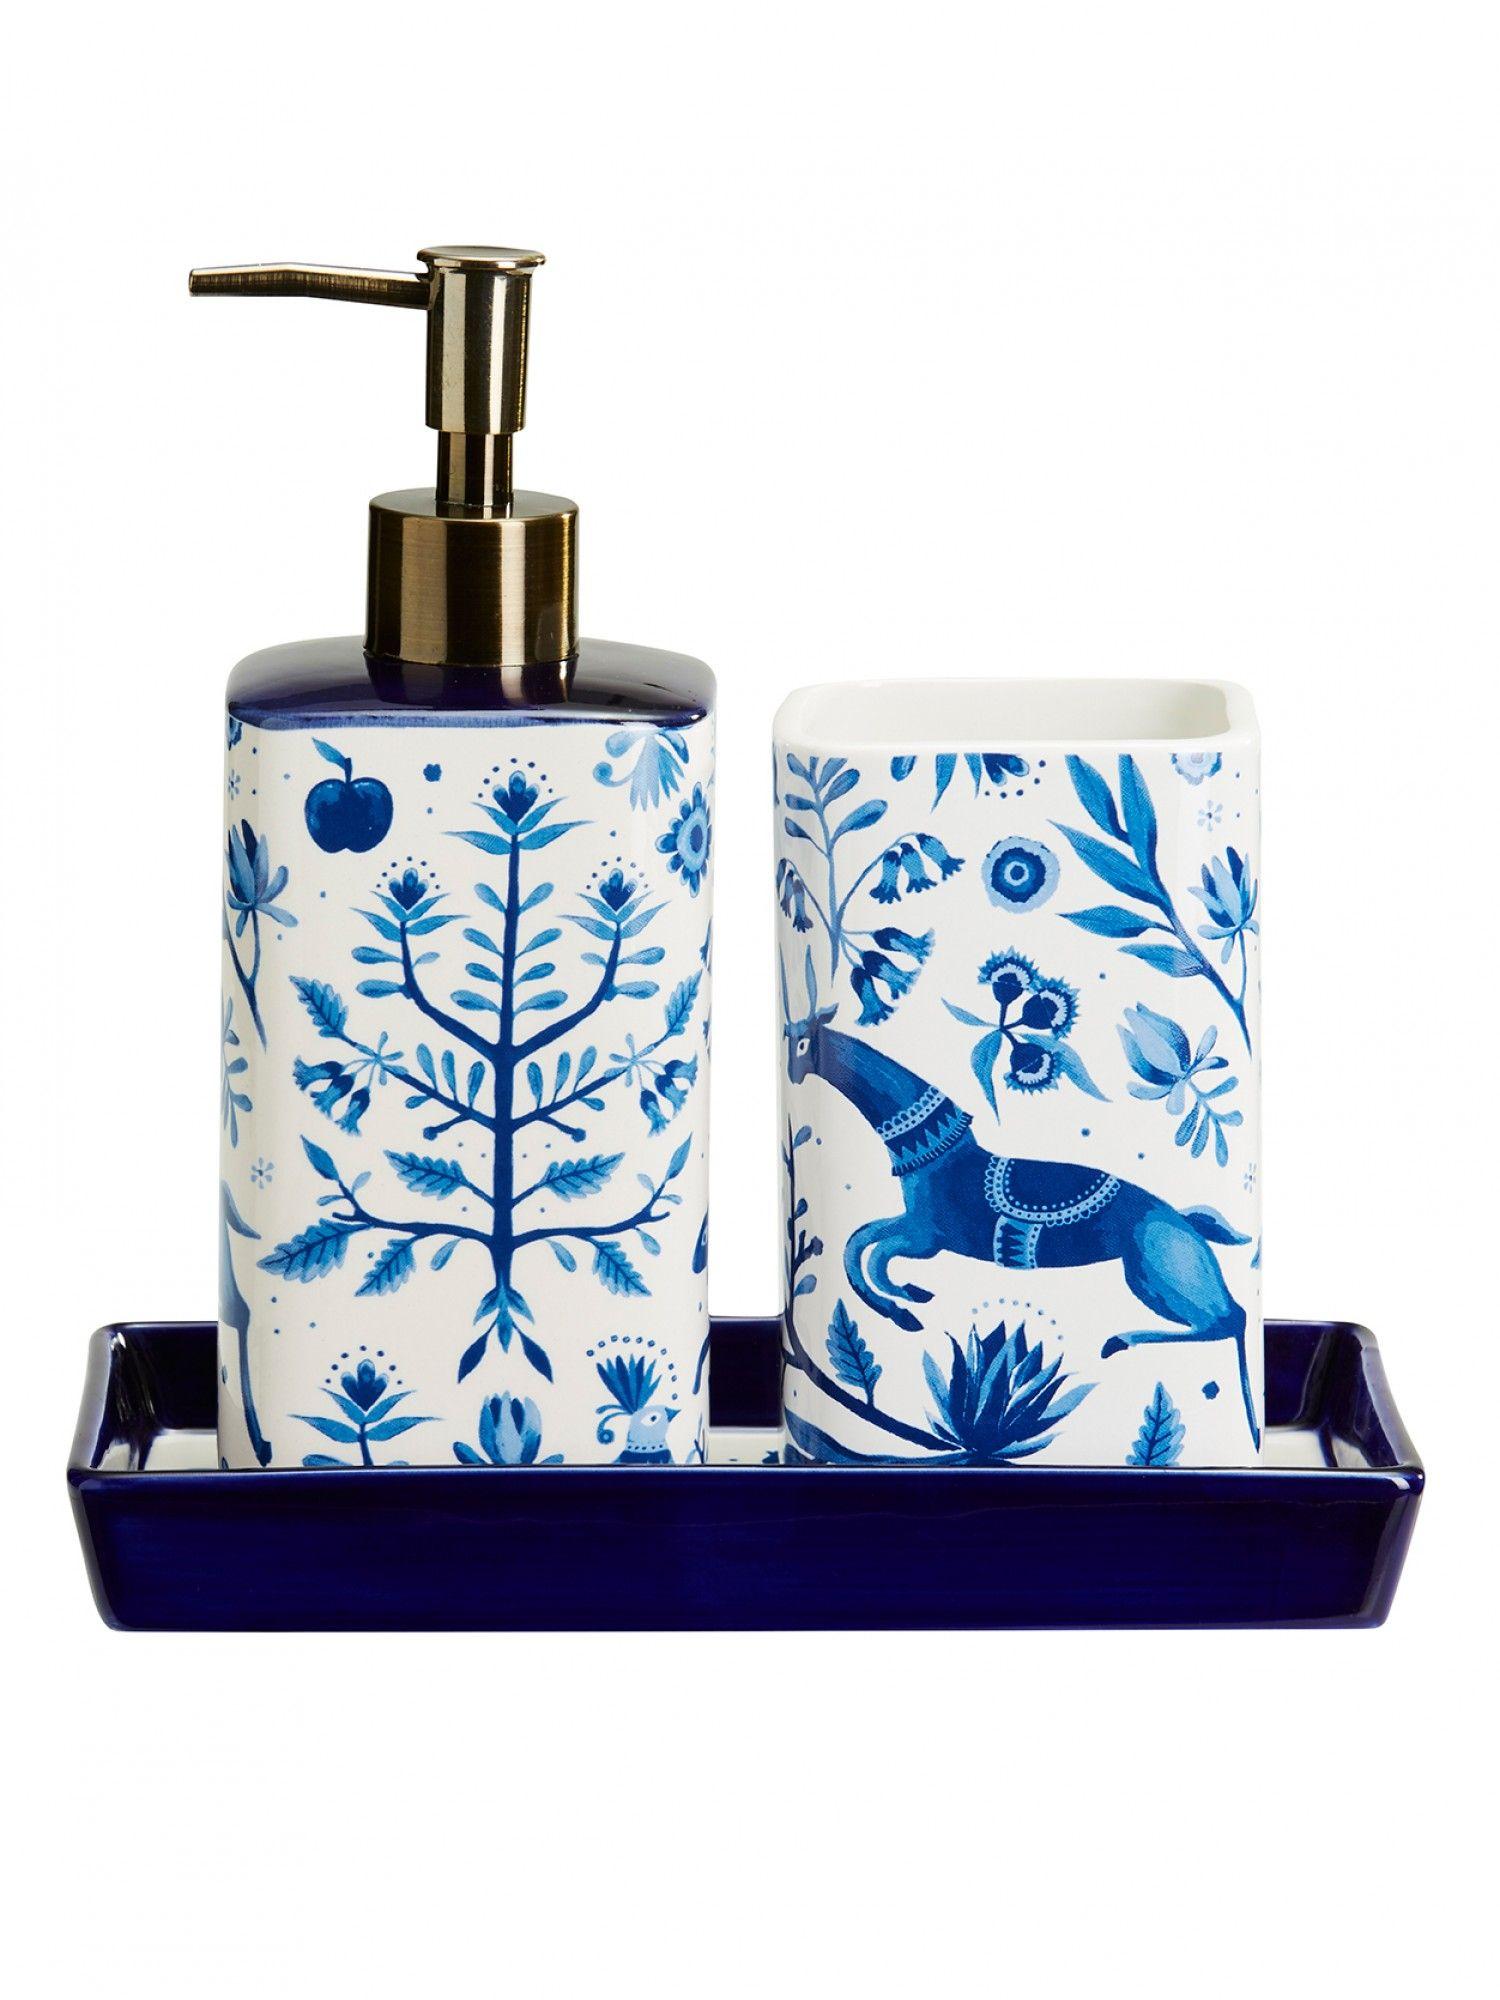 OTOMI CERAMIC BATHROOM CADDY Mozi - Australian lifestyle and designs ...